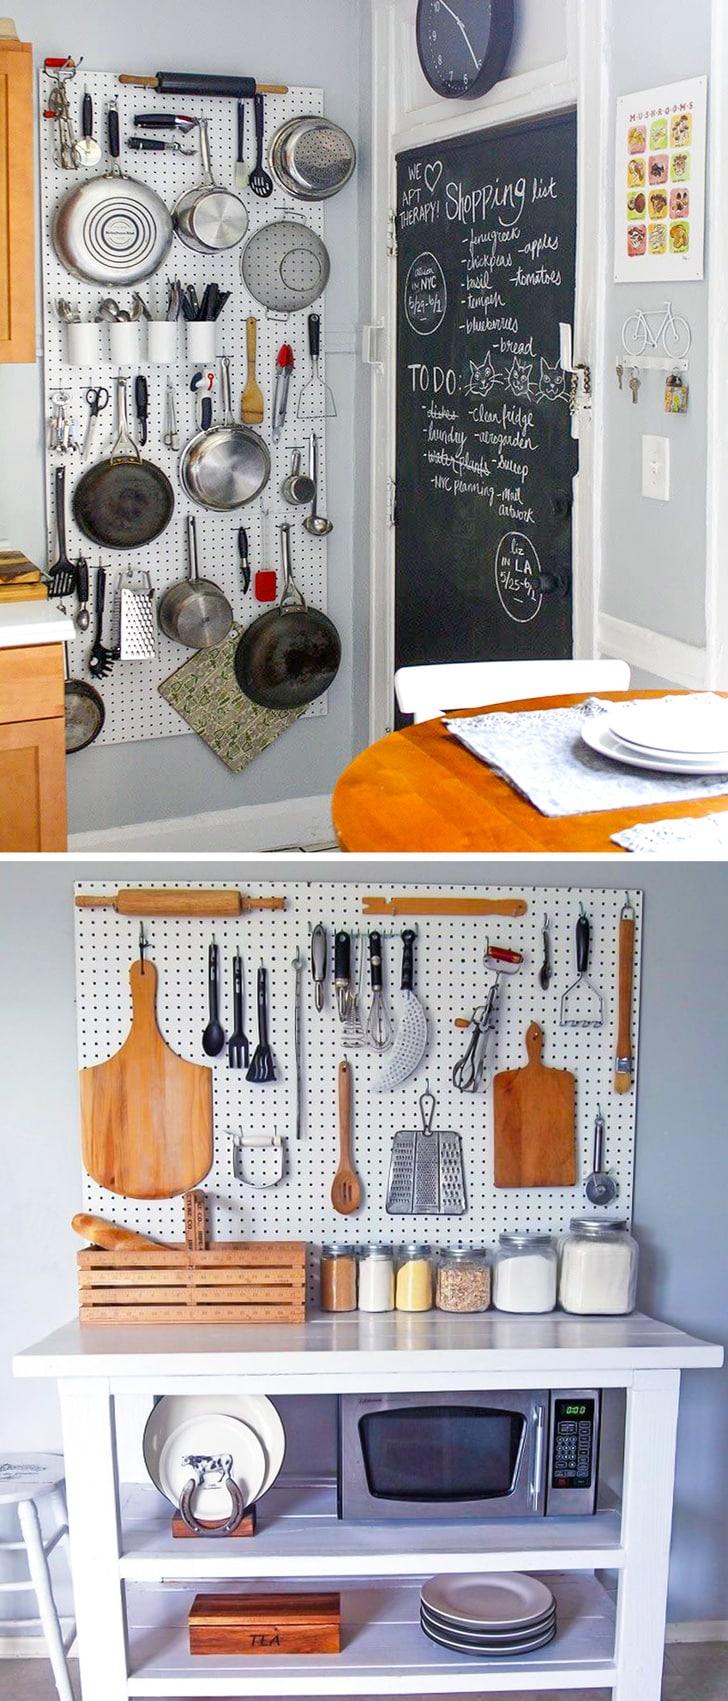 13 Best Ideas To Turn Your Kitchen Bigger 3